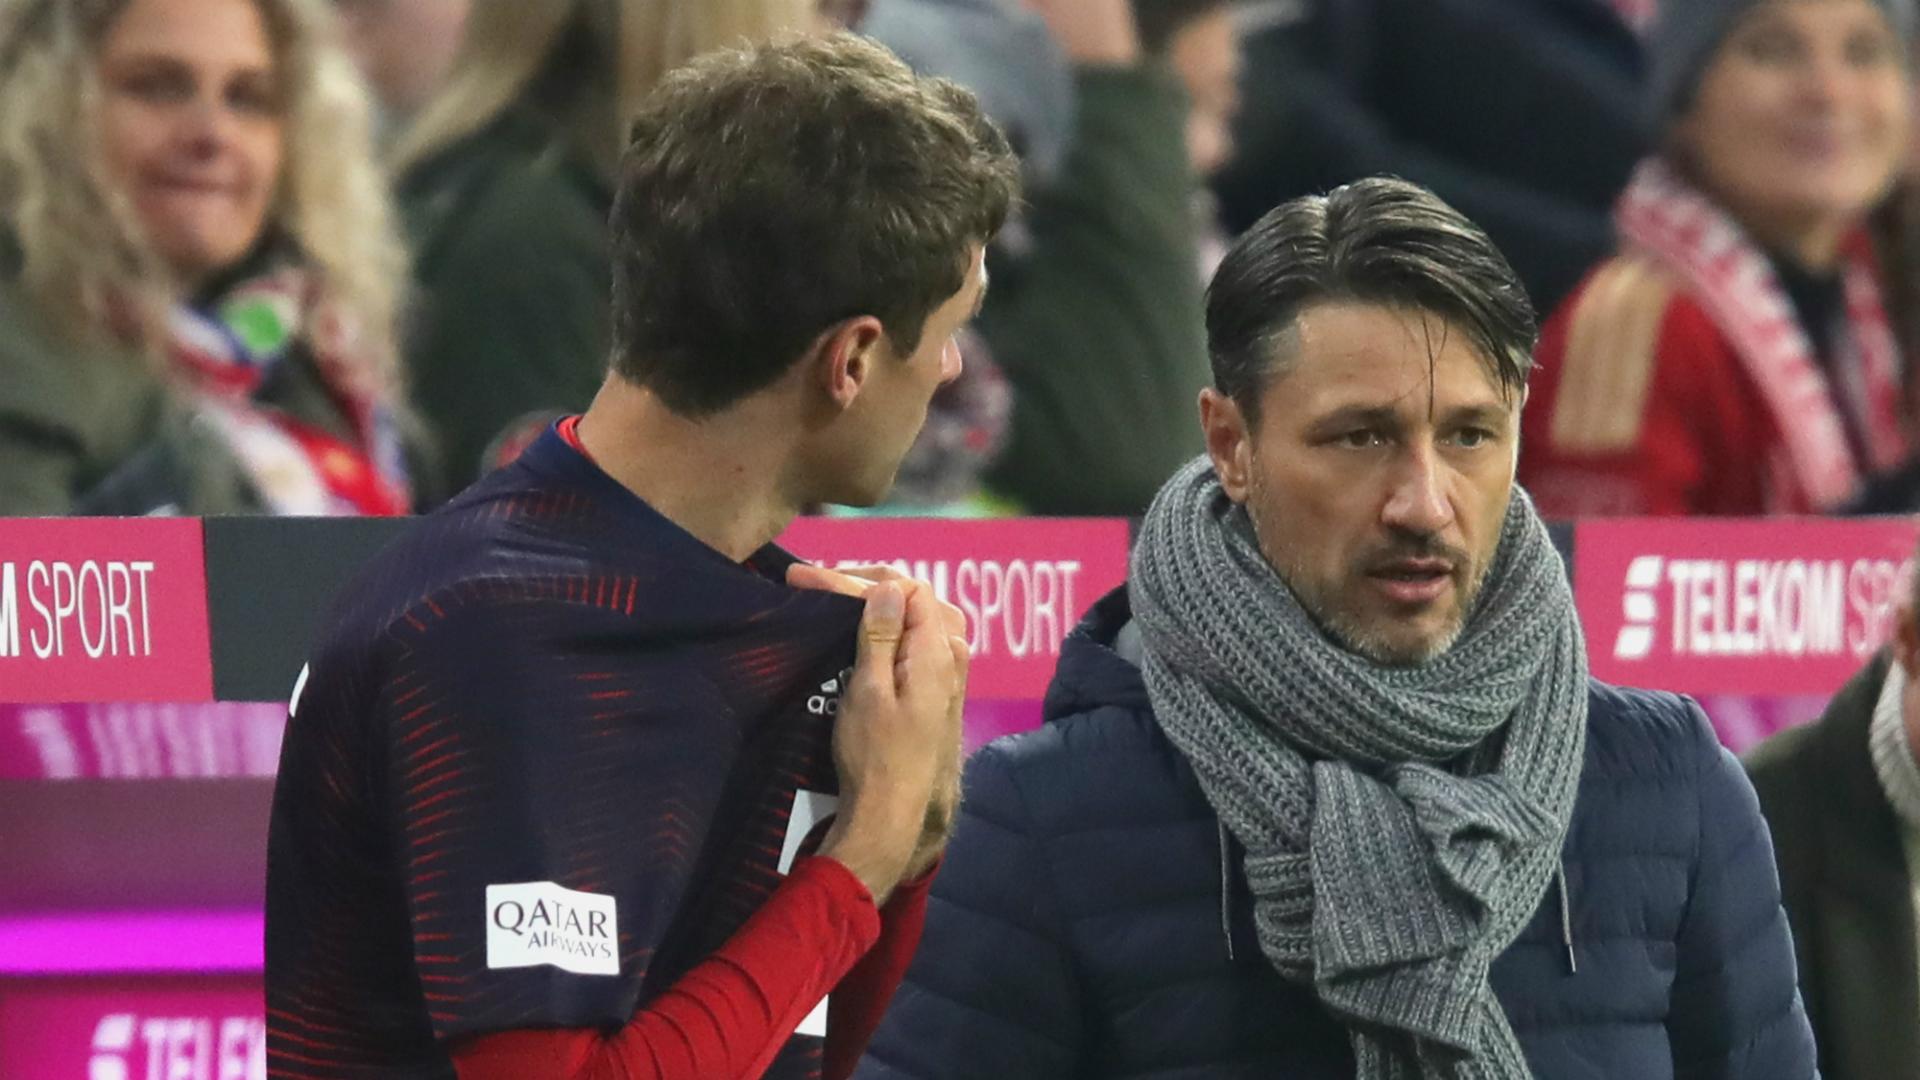 Thomas Muller's wife Lisa apologises to Niko Kovac over Instagram criticism